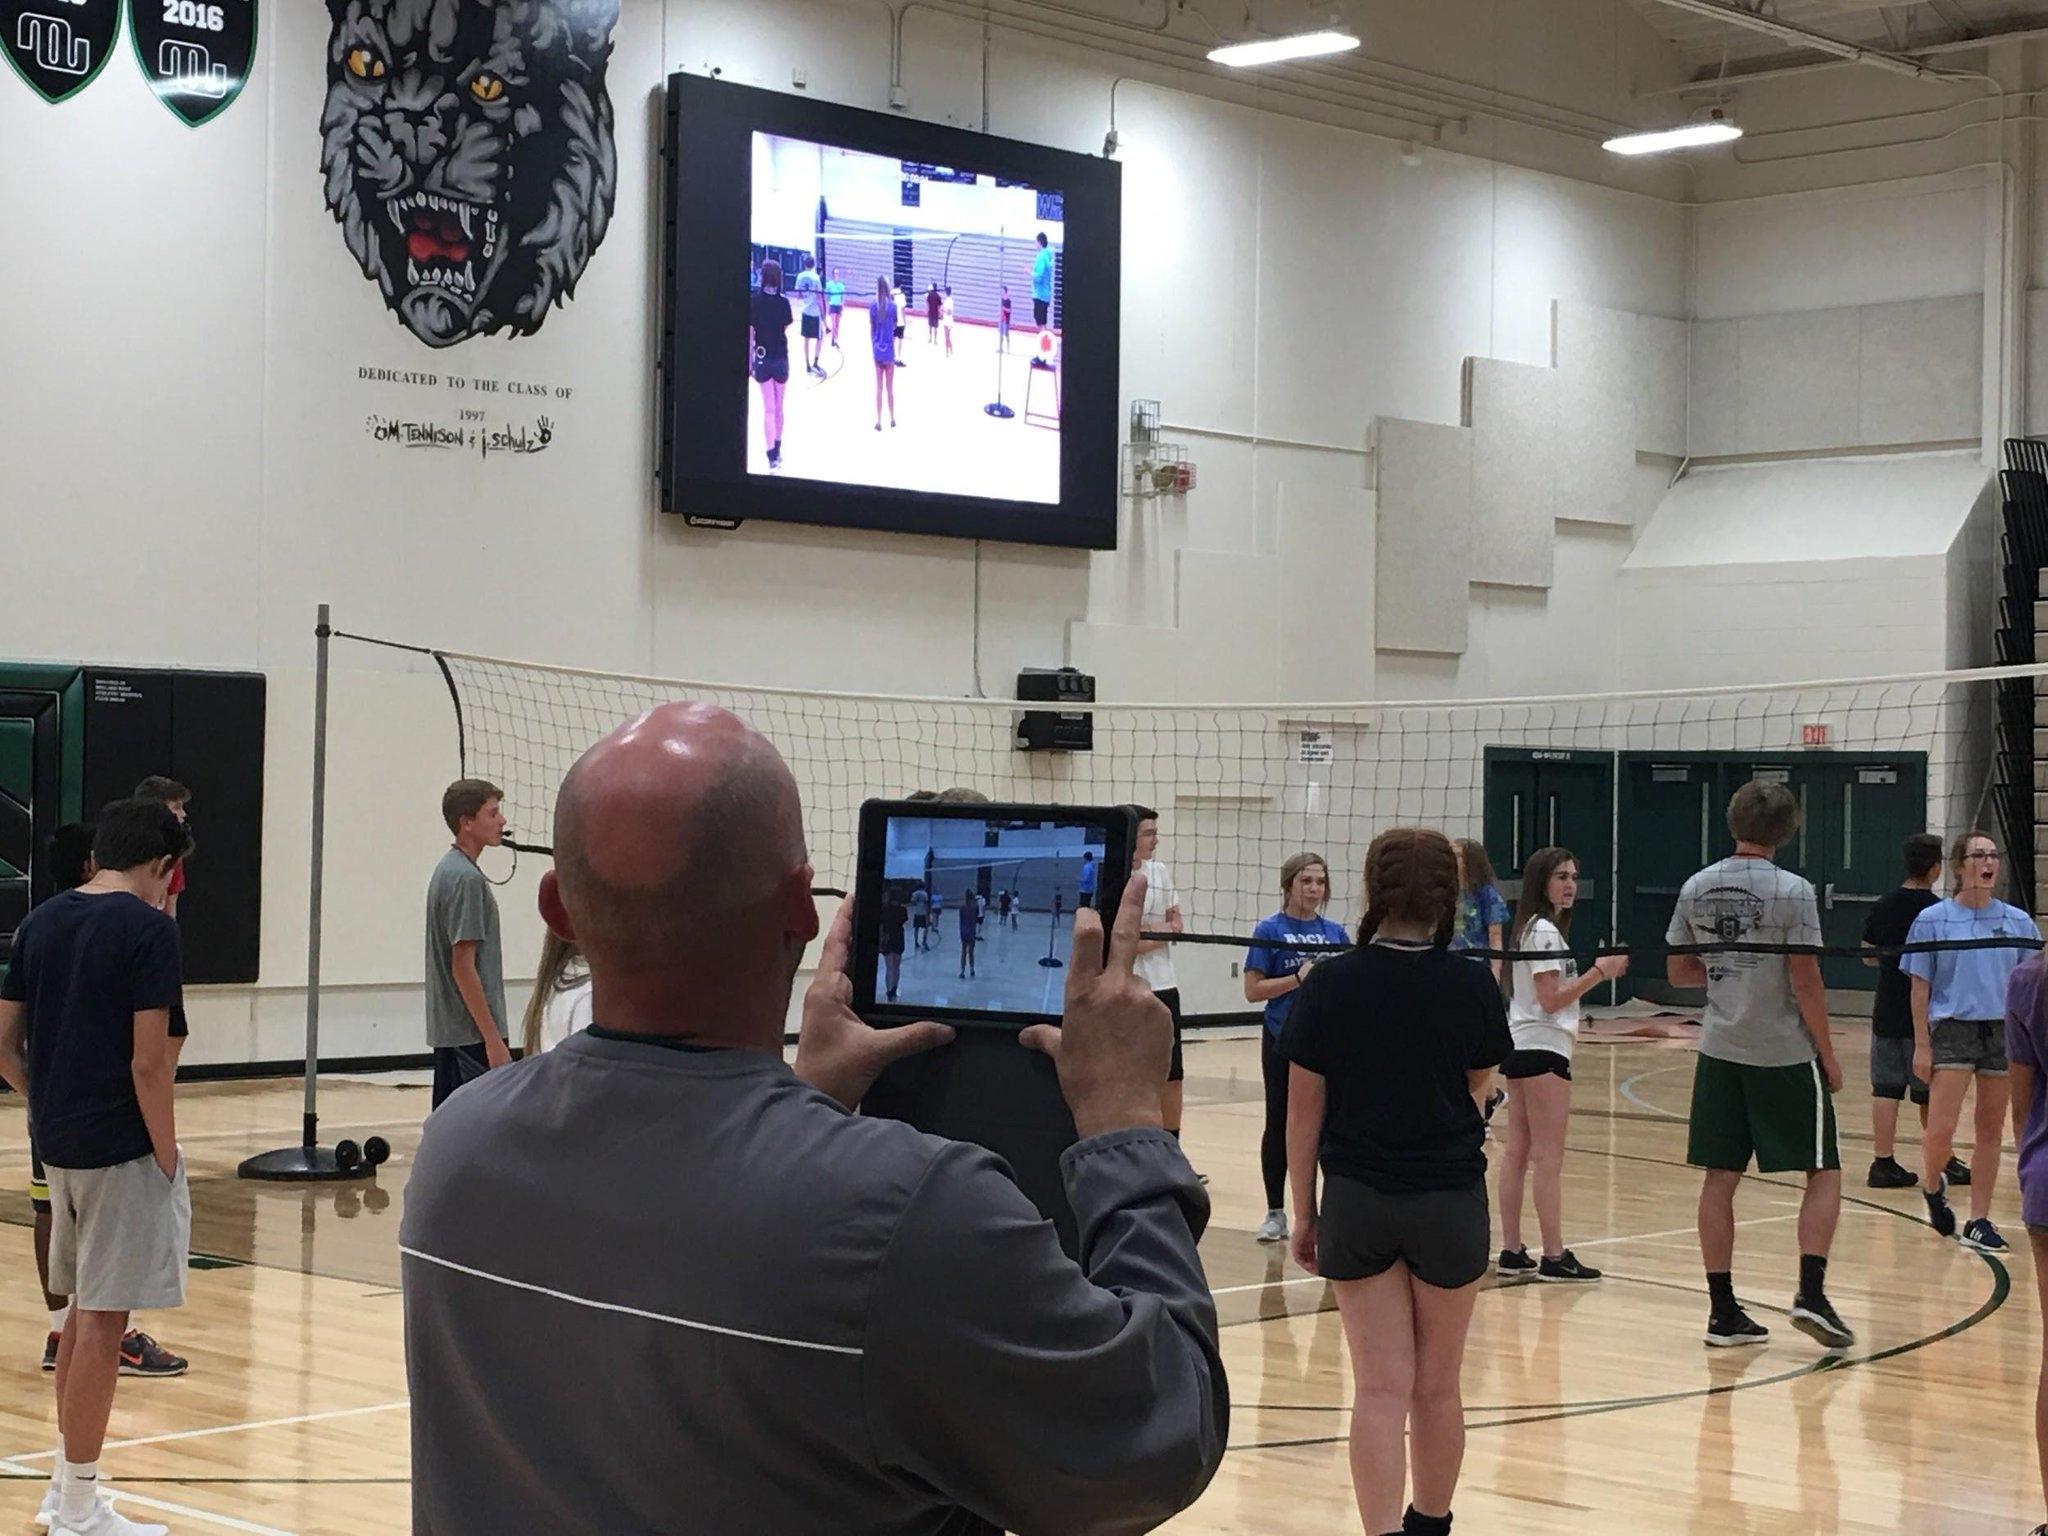 Millard West Gym Class Live Video Feed